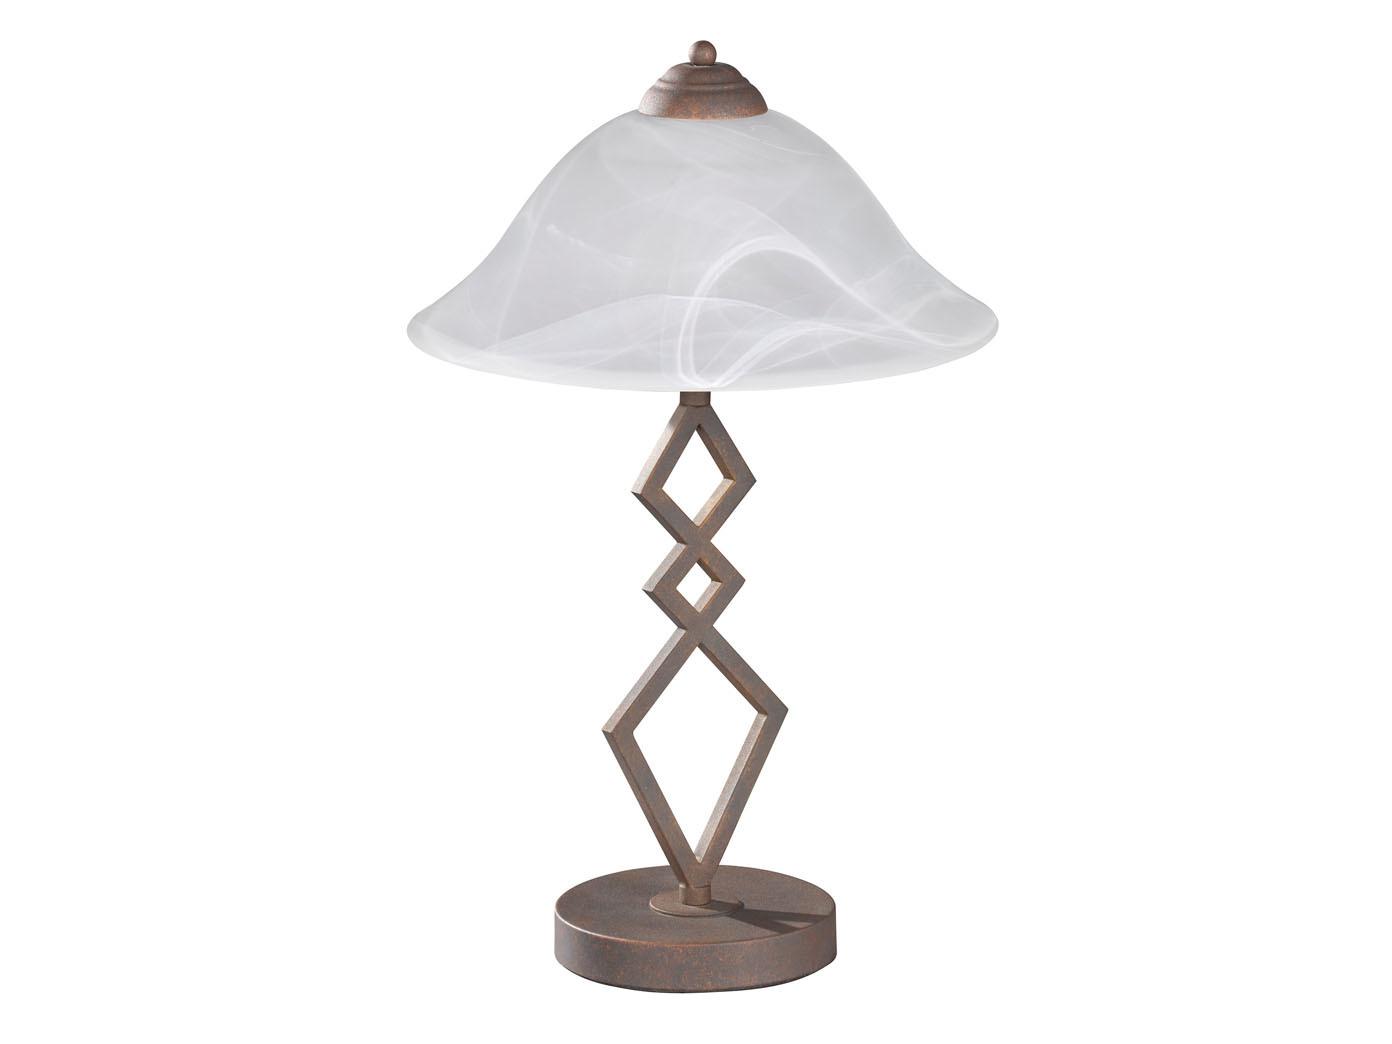 landhaus tischleuchte mit e27 led wohnzimmerlampe antik. Black Bedroom Furniture Sets. Home Design Ideas